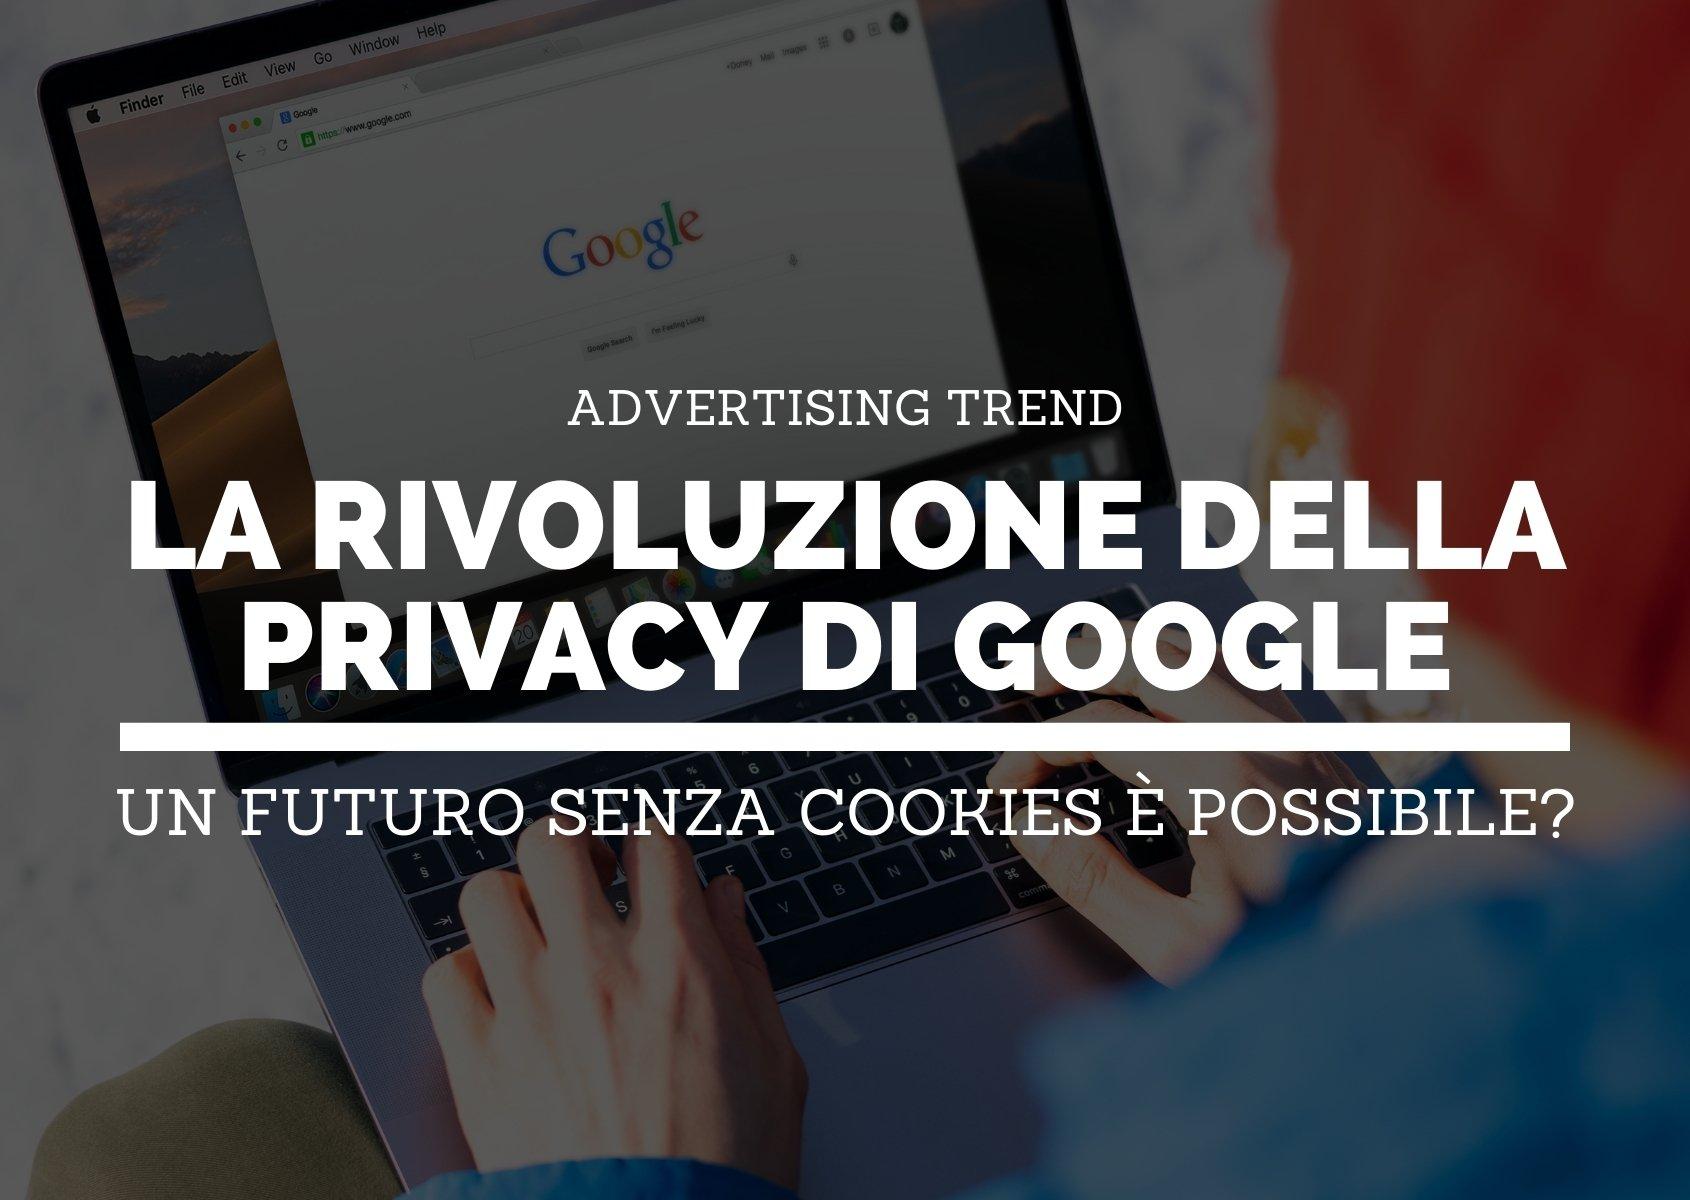 Rivoluzione-google-coockies-header